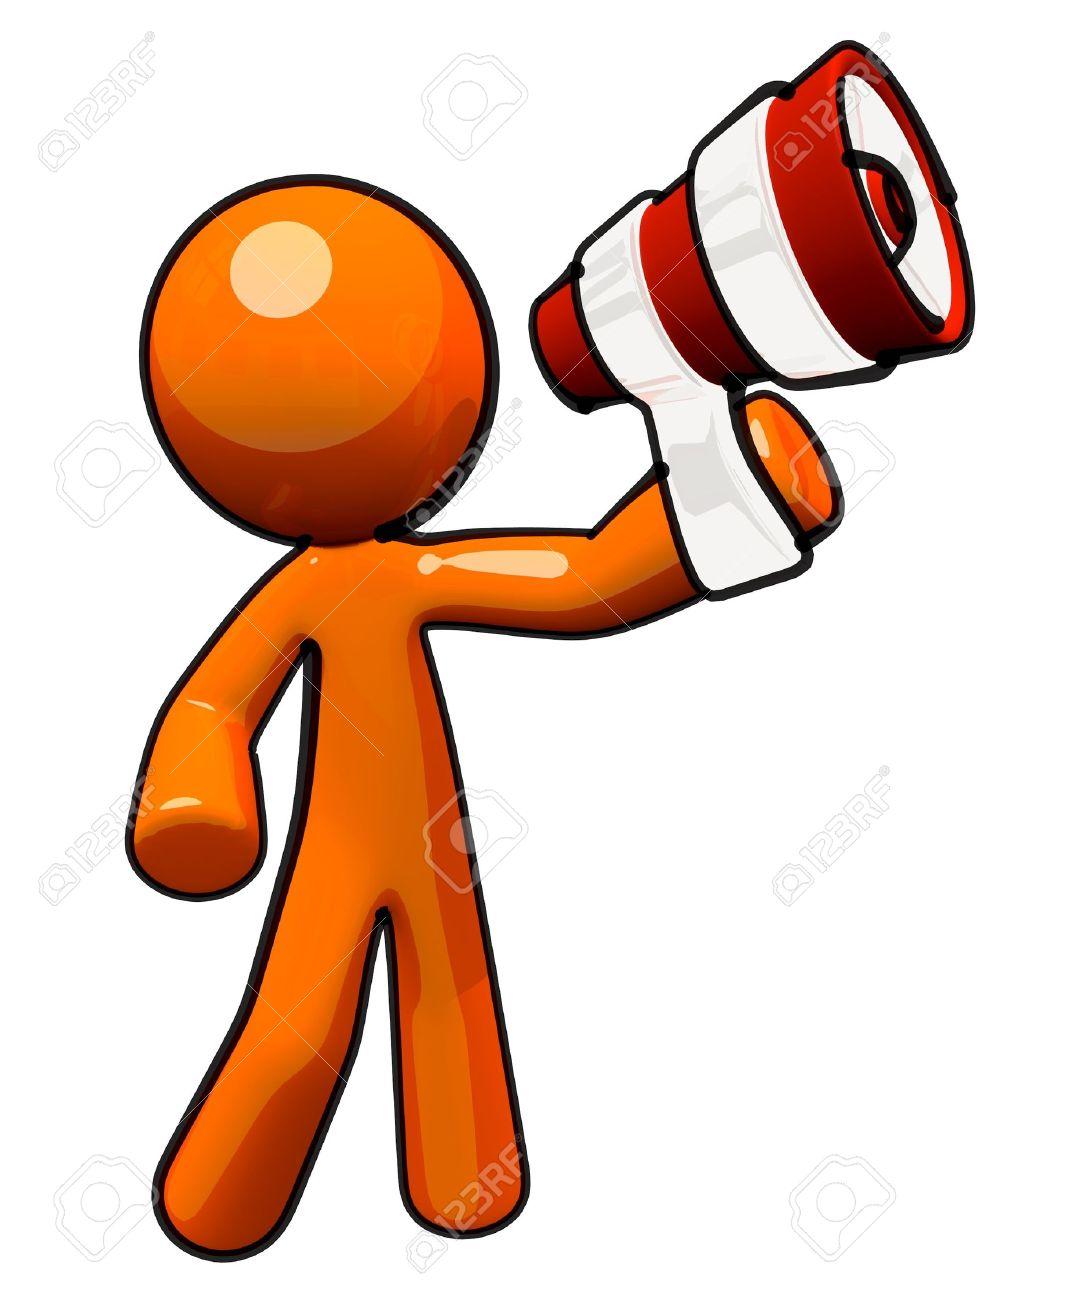 Broadcasting and communications image. Orange man with megaphone. Stock Photo - 11134524